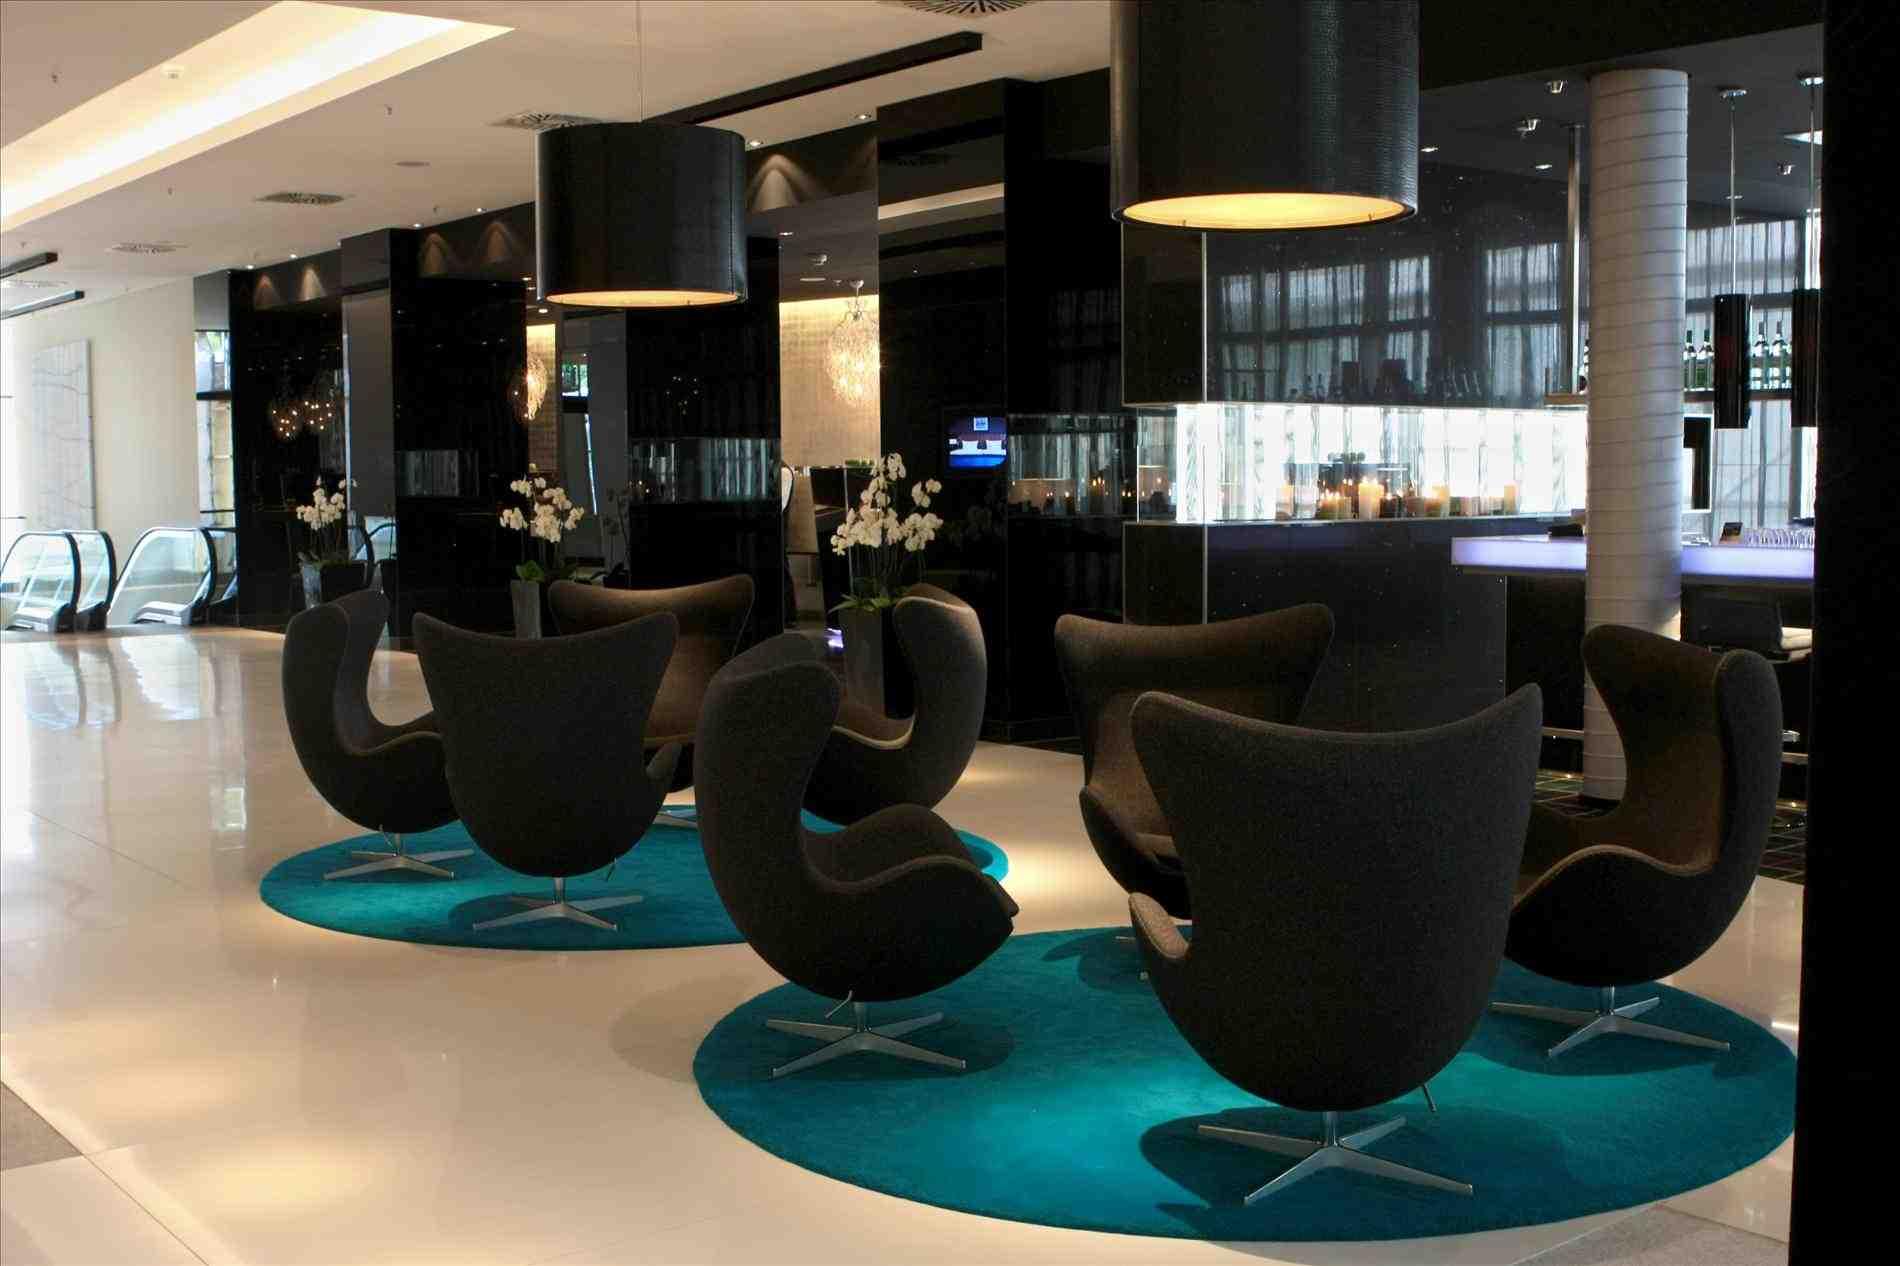 . Outstanding lighting modern ideas to decor Hotel Lobby